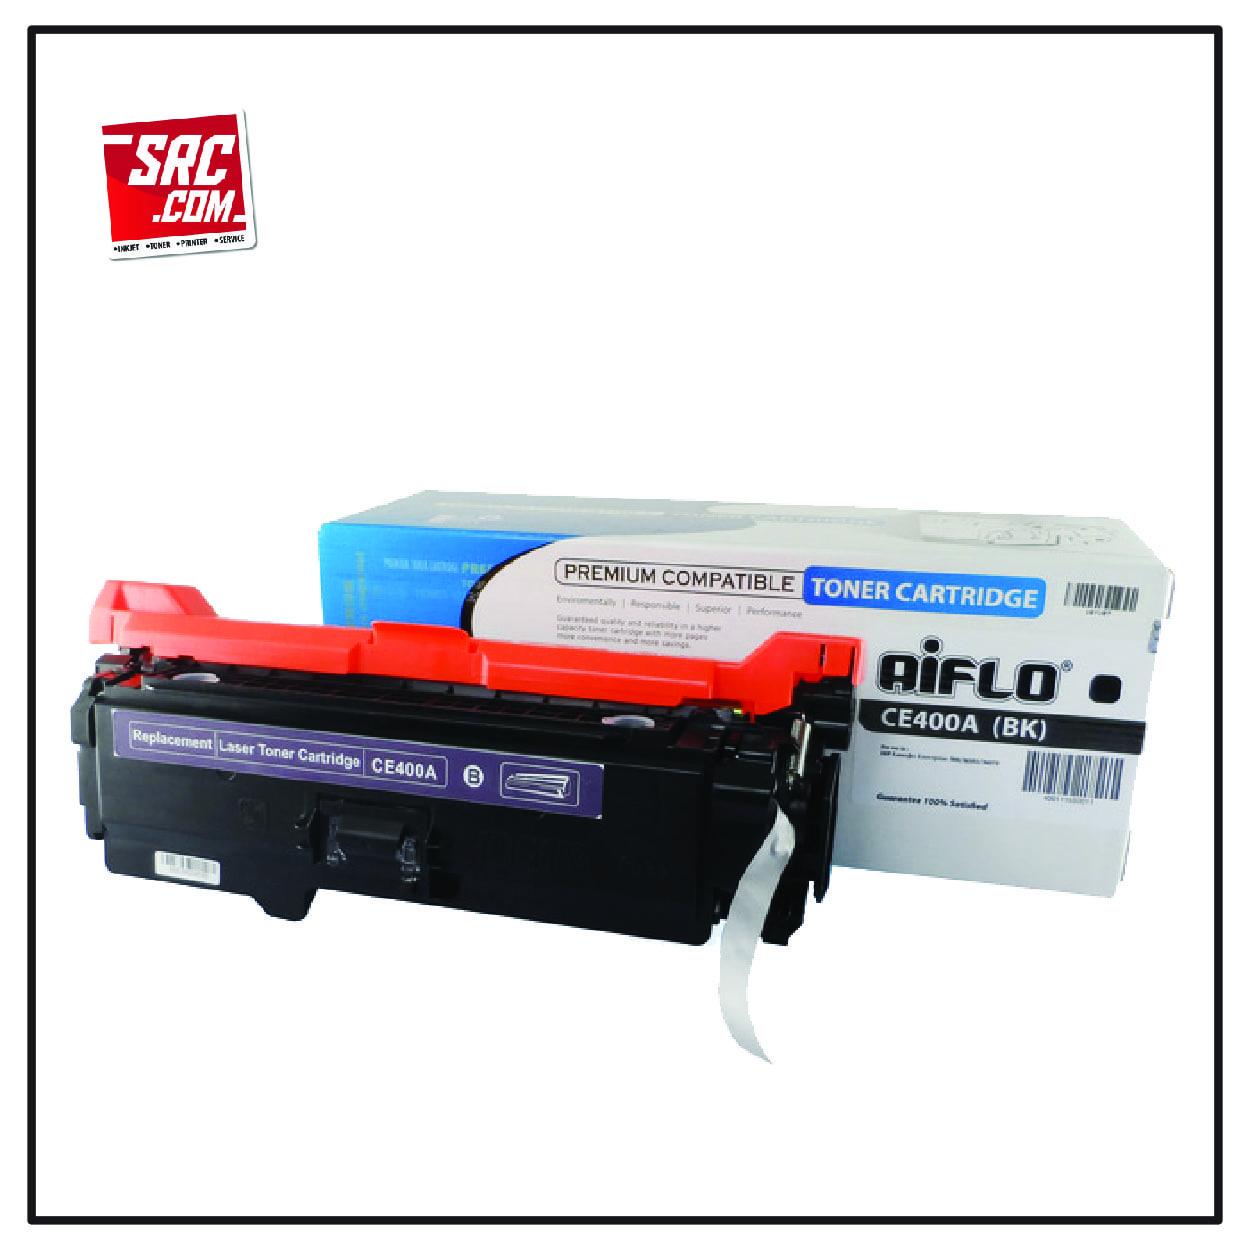 Jual Toner Hp 507a Black Ce400a Compatible Cartridge Aiflo Plug In 810 Smart Printer Inkjet Ip2770mp237